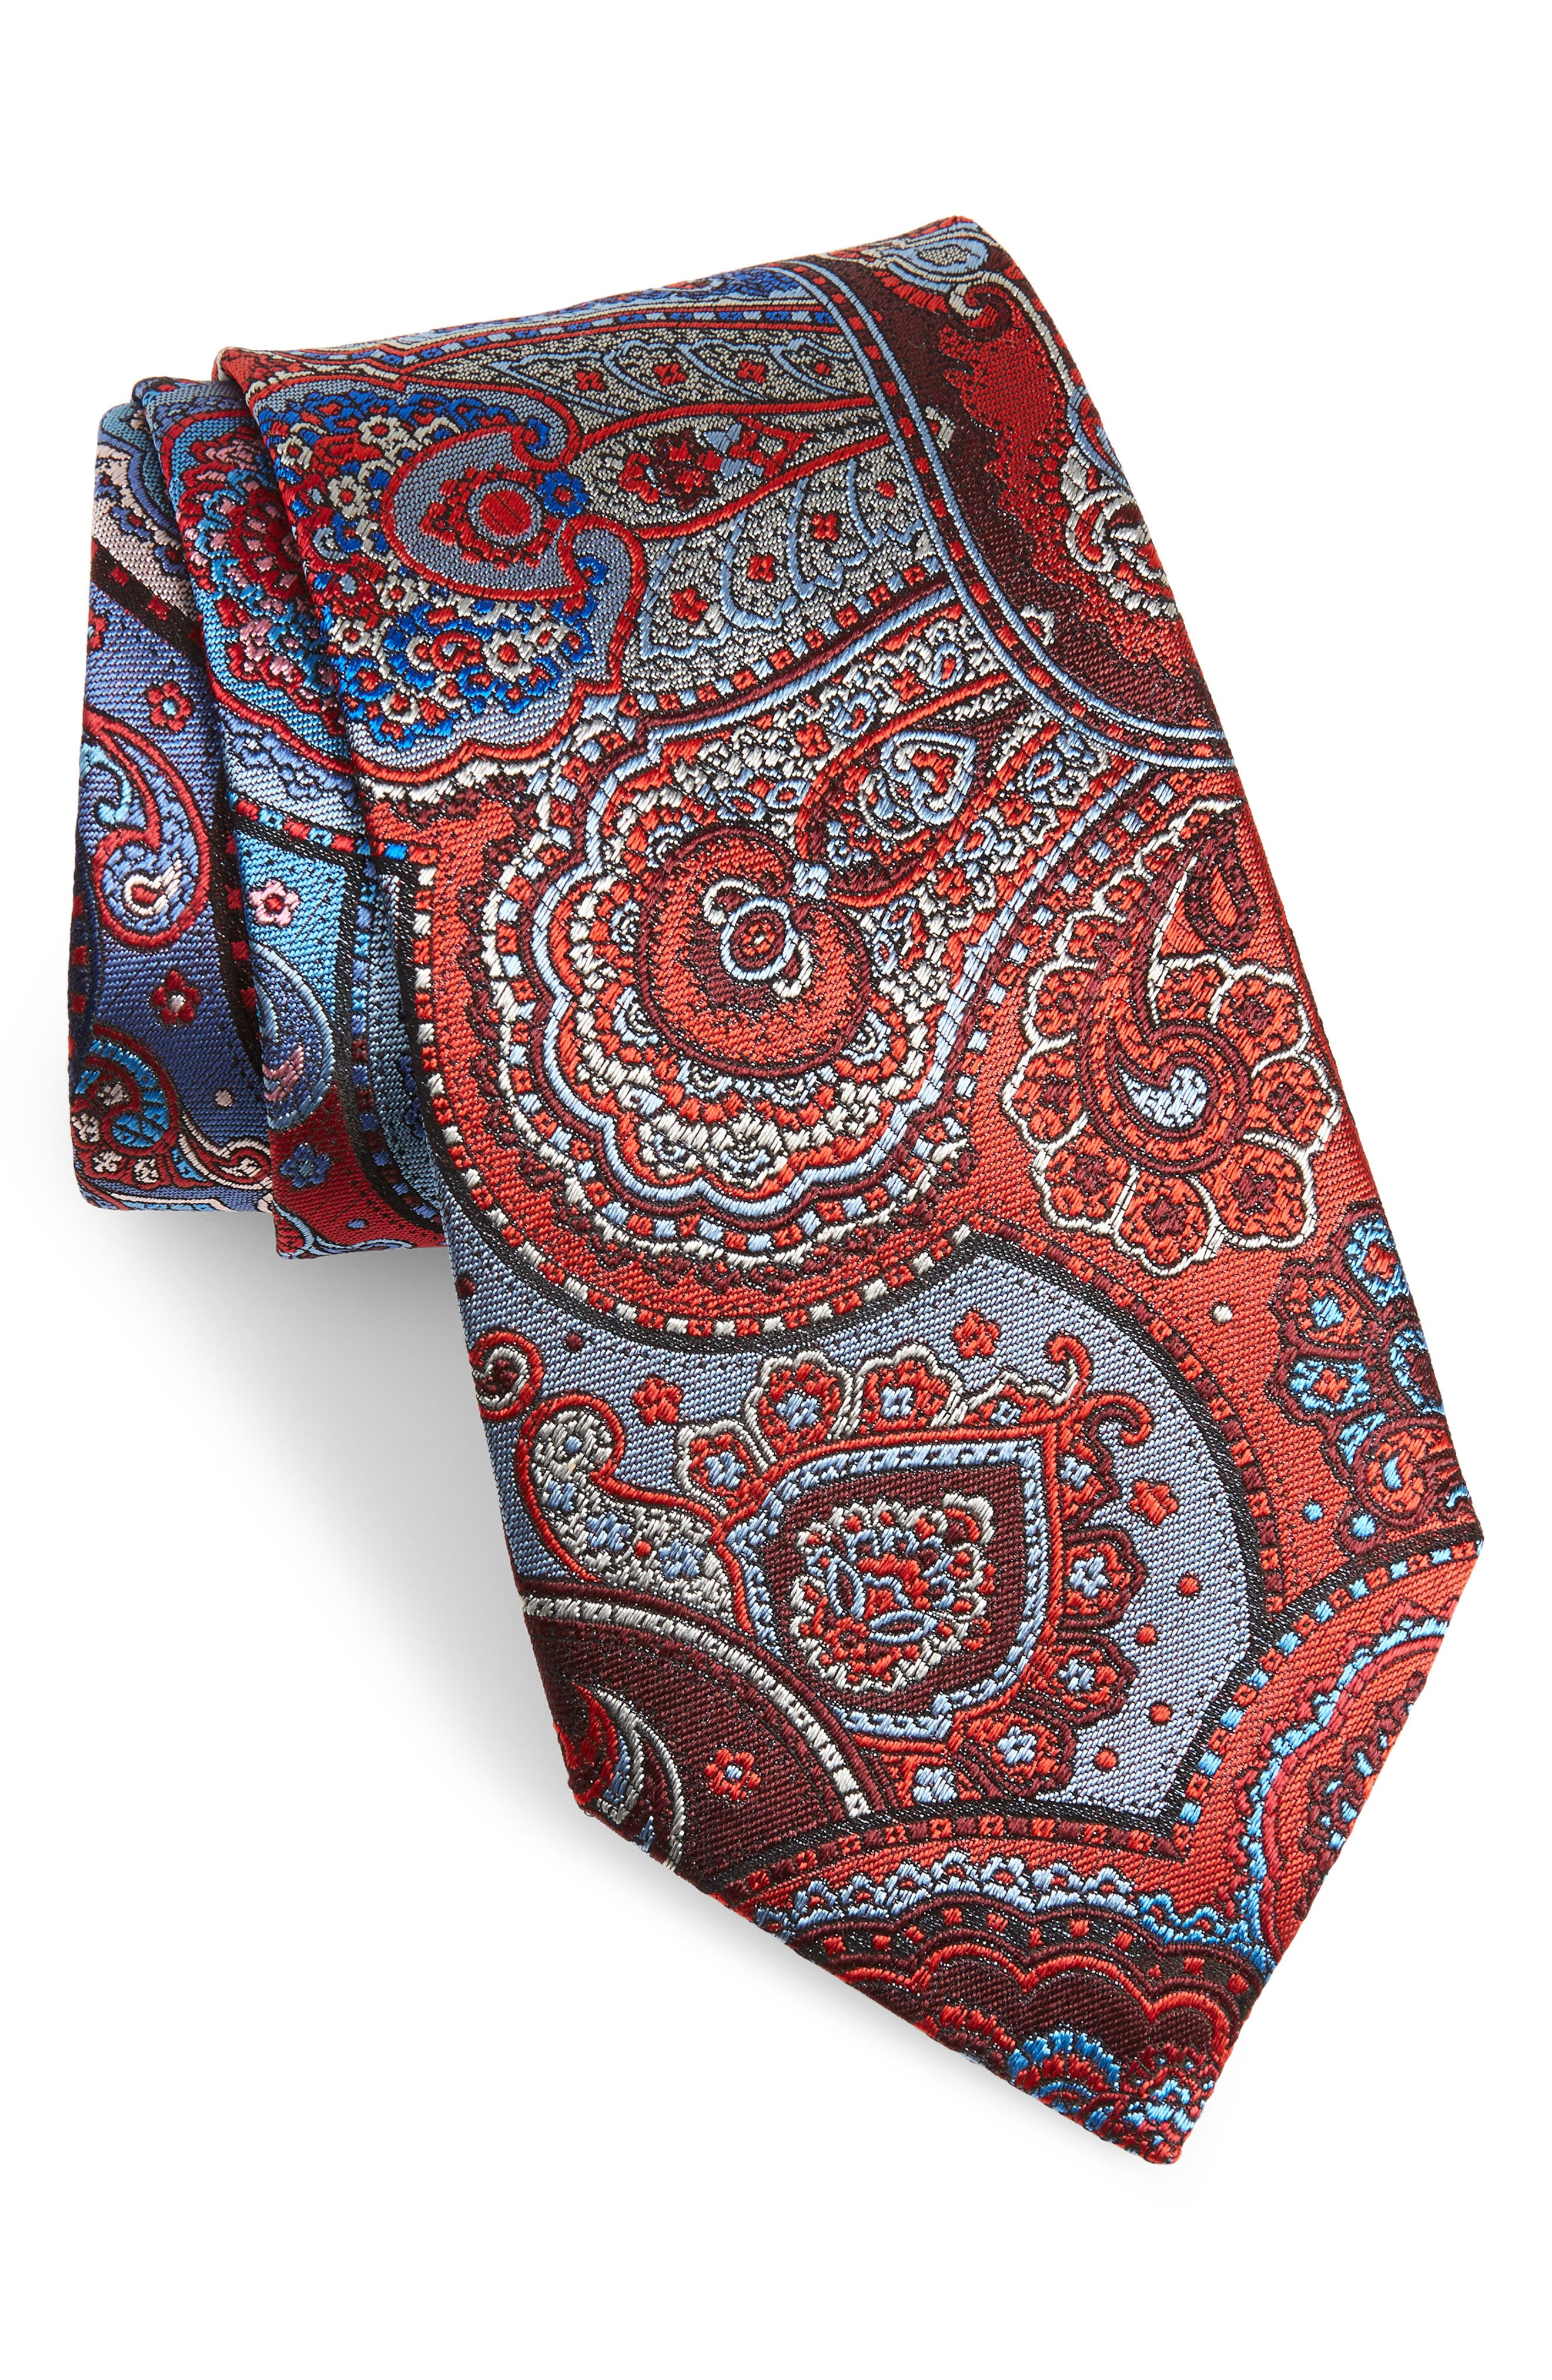 ERMENEGILDO ZEGNA Quindici Paisley Silk Tie, Main, color, RED